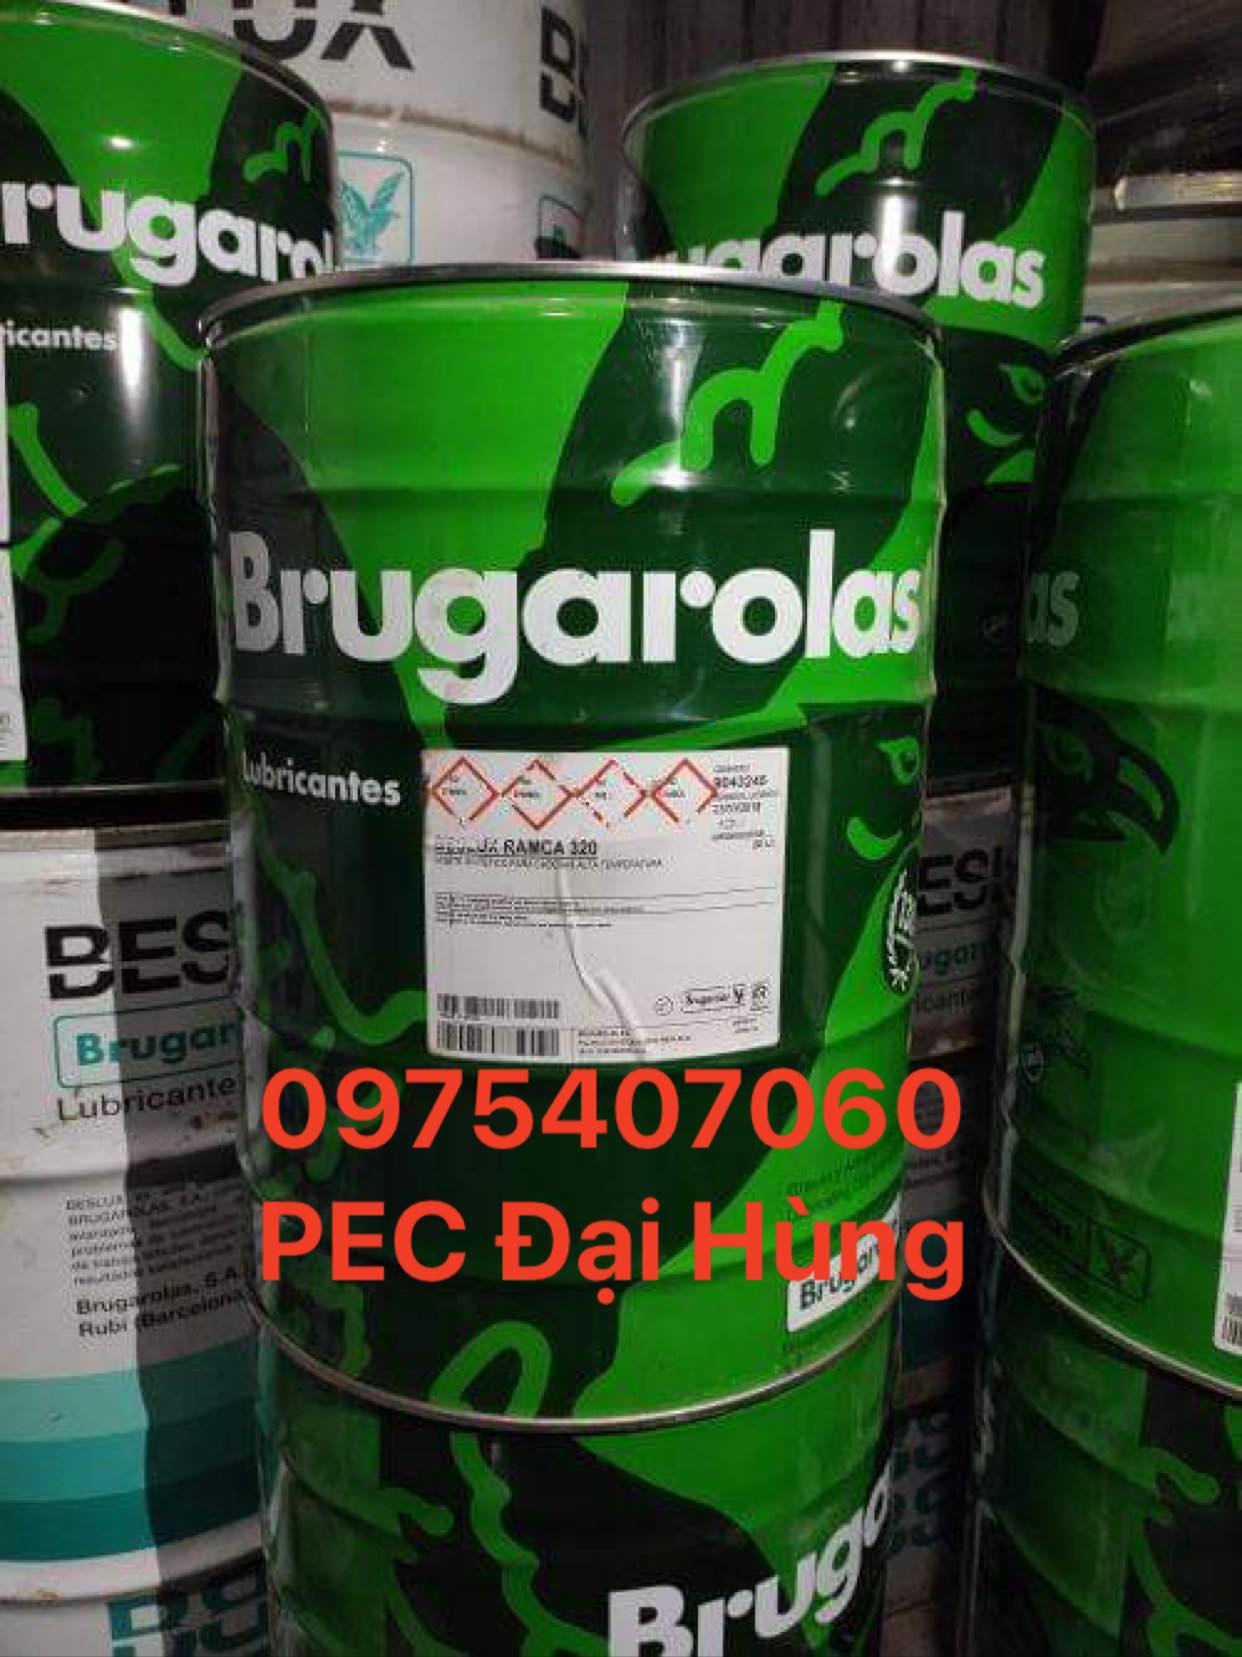 Dầu xích chịu nhiệt Brugarolas Beslux RamCa 320